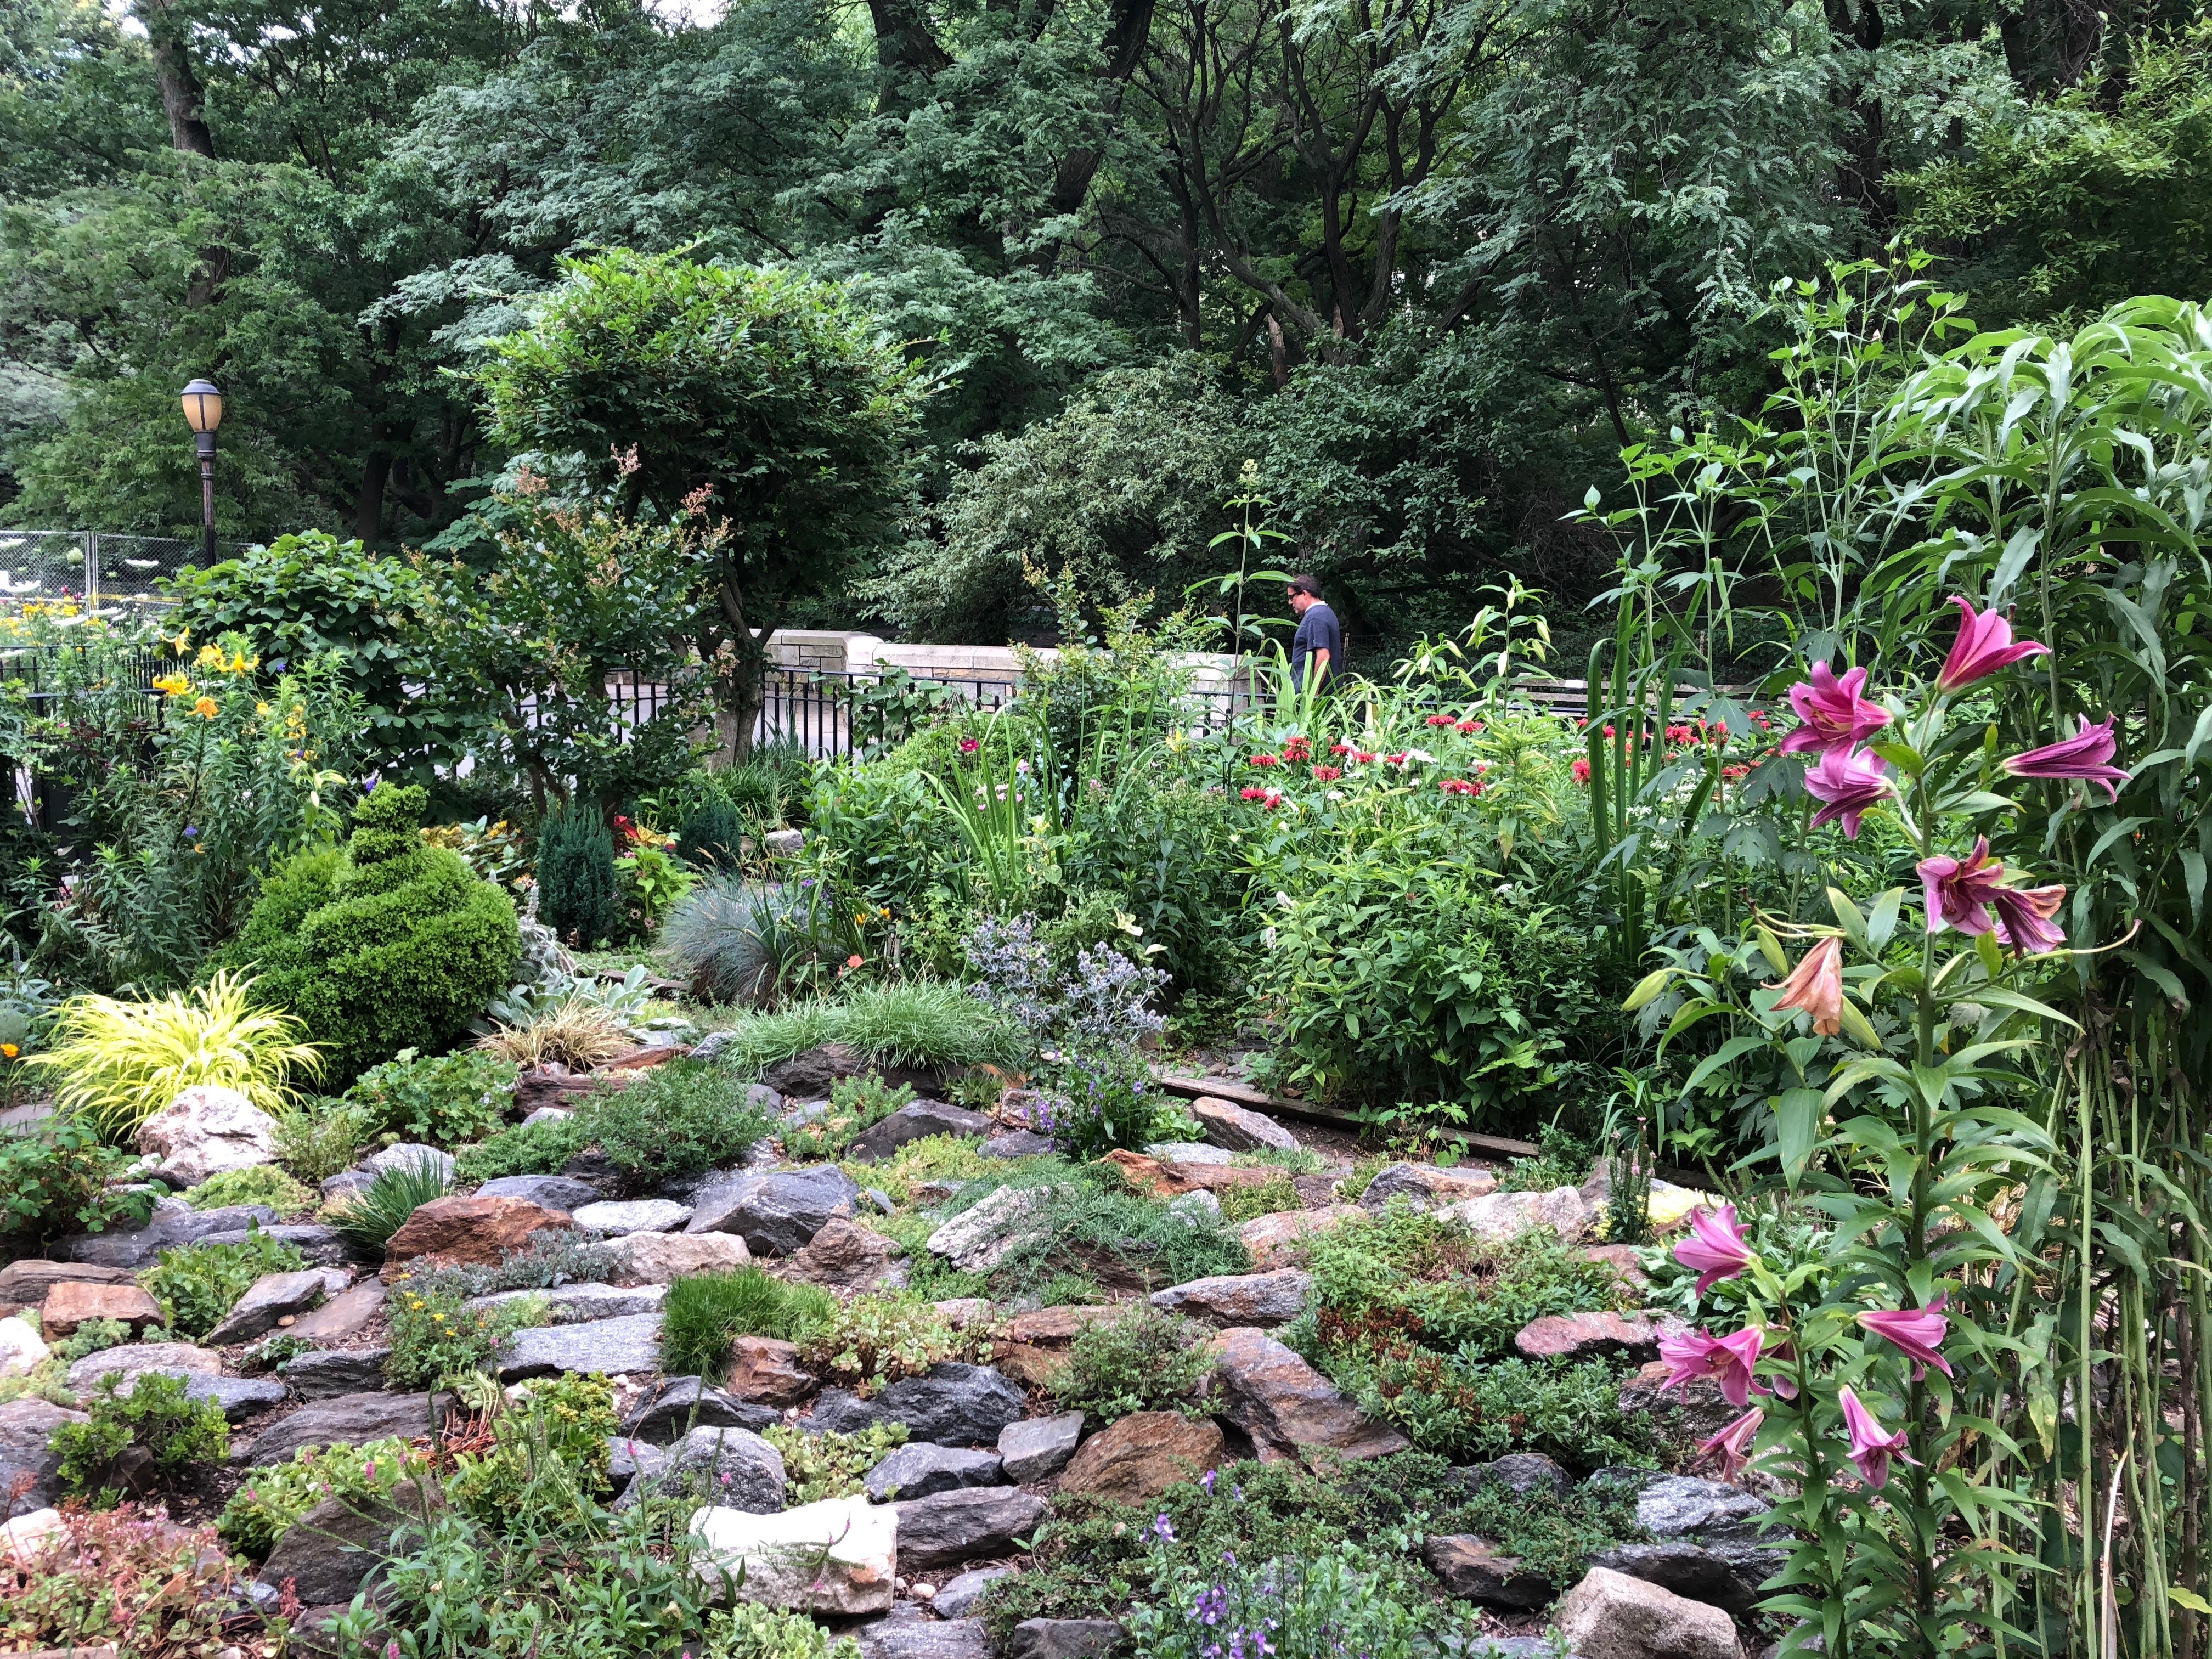 071118-Riverside-Garden-3